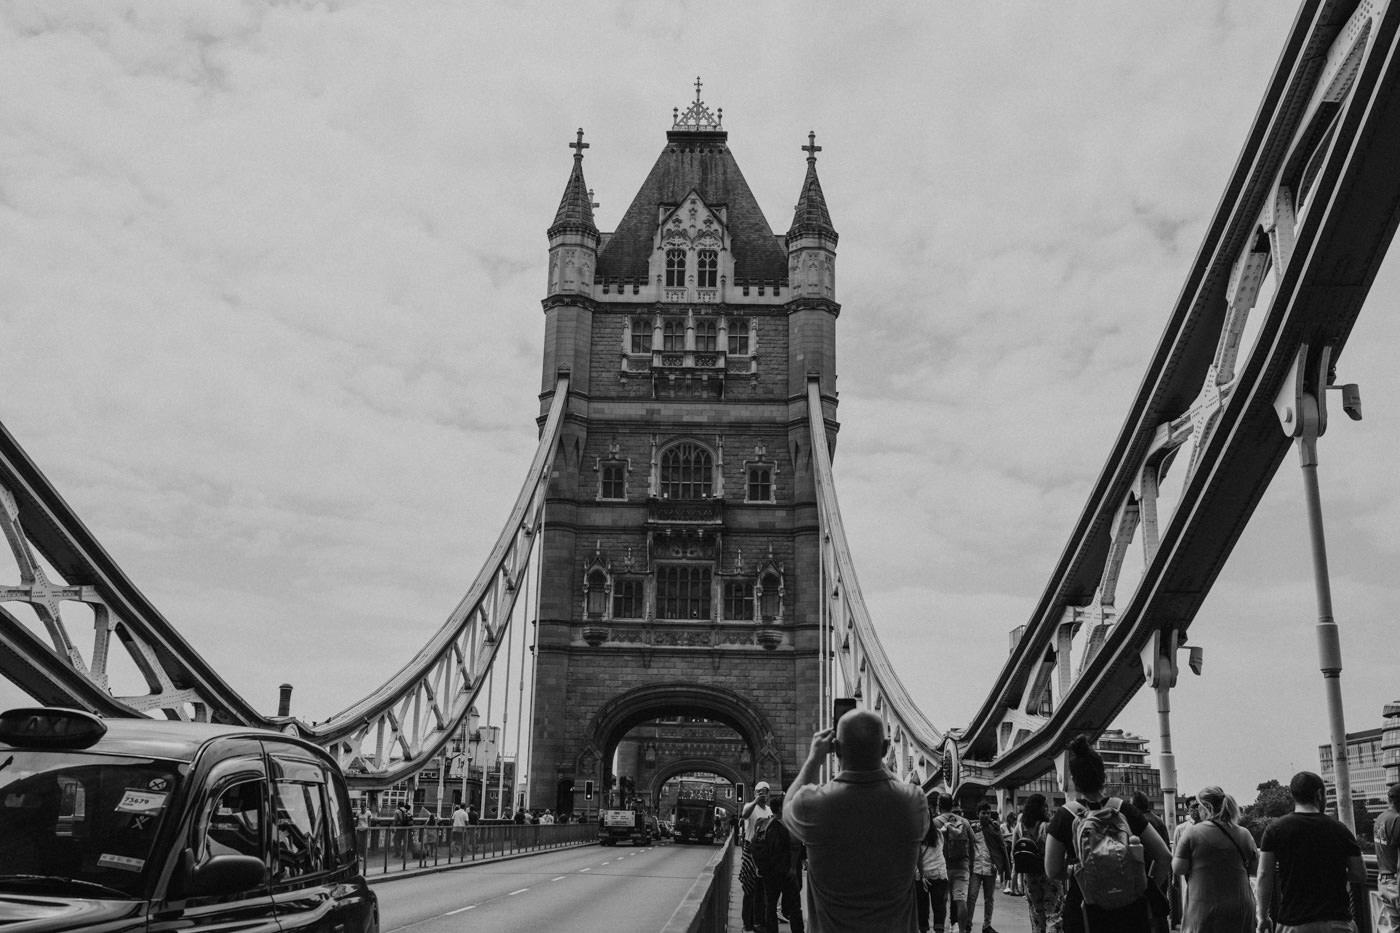 LONDYN ASYLUM CHAPEL & SEVEN SISTERS CLIFFS 27